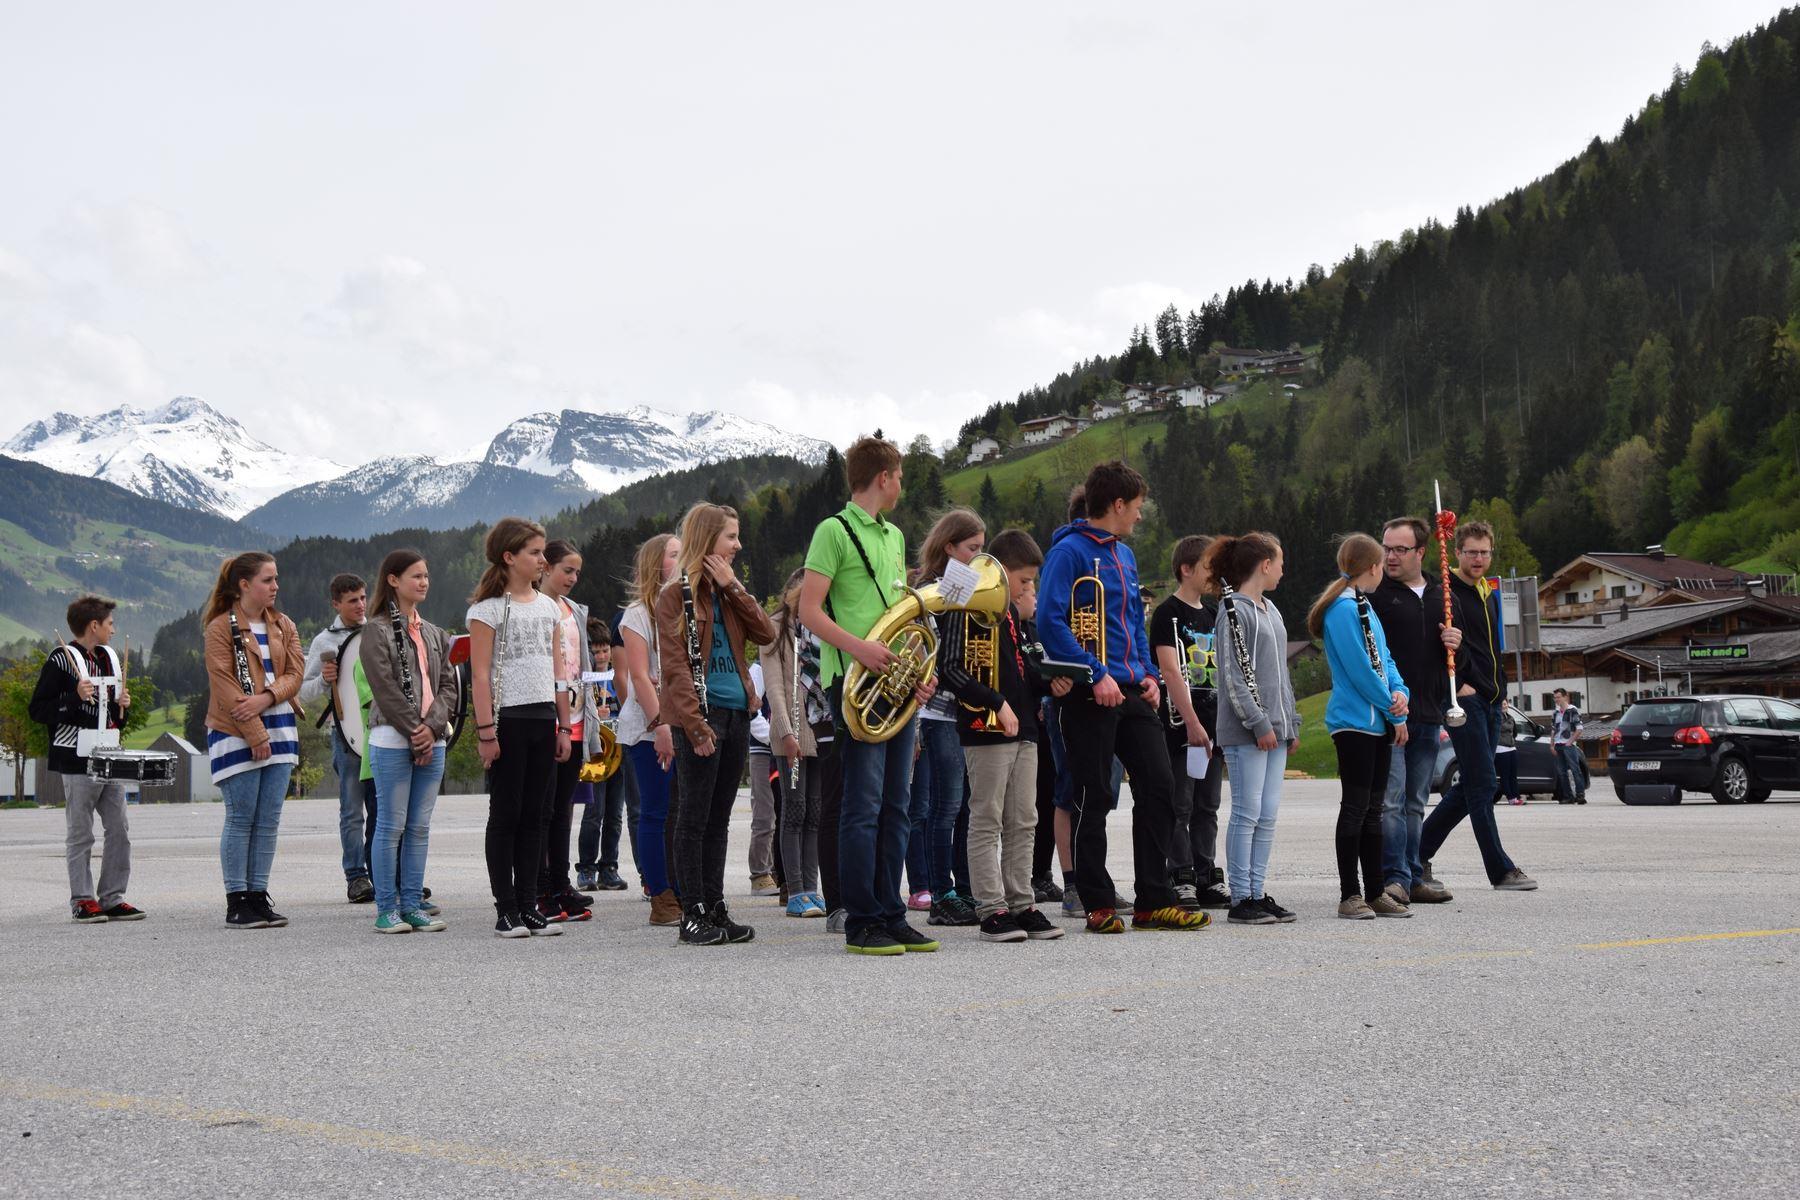 2015-05-02 Marschierprobe Jugend (20).jpg